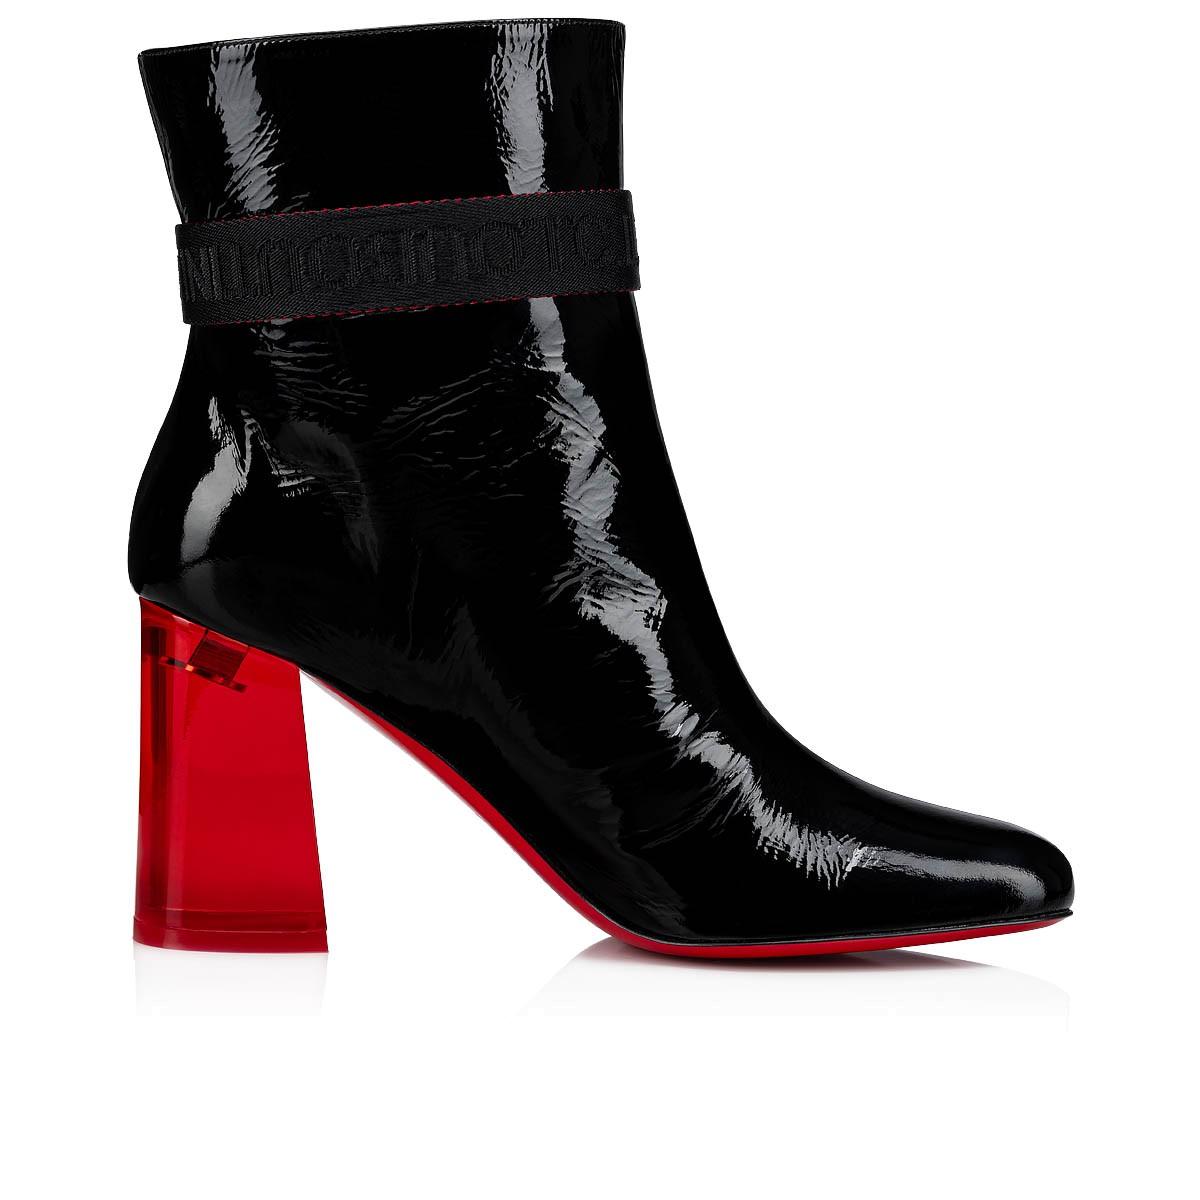 Shoes - Telesiege - Christian Louboutin